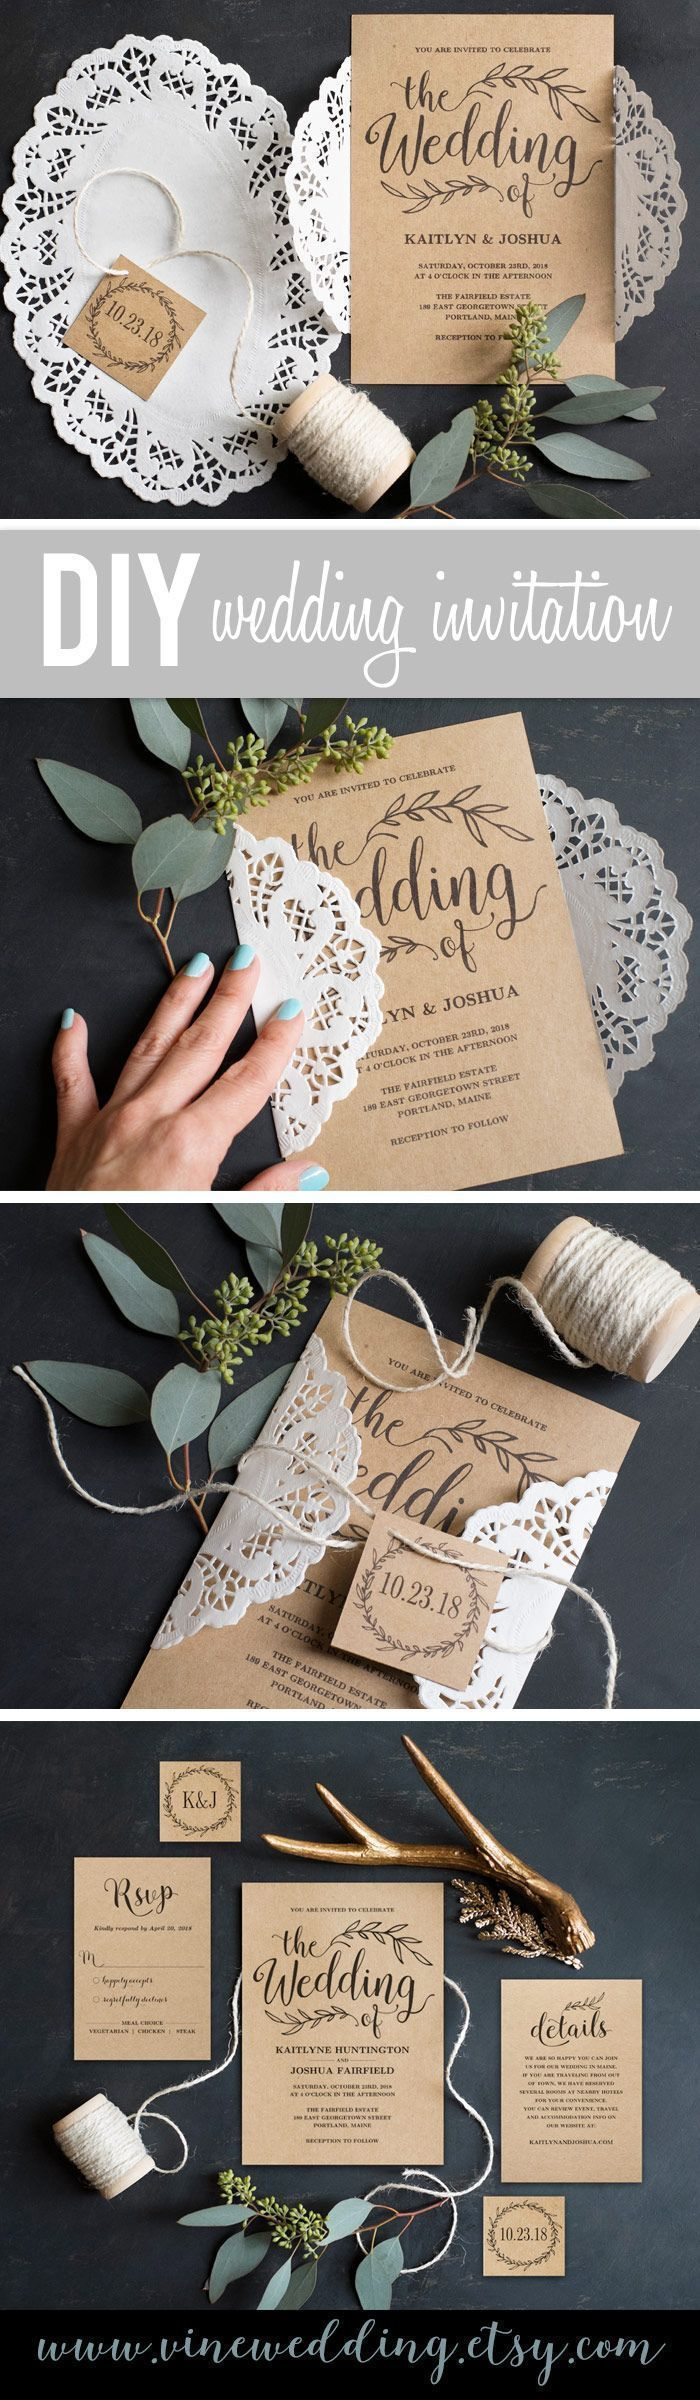 wedding invitation decoration clip art%0A DIY Doily Paper Rustic Wedding Invitations   I u    m actually getting married     Pinterest   Weddings  Wedding and Bridal showers